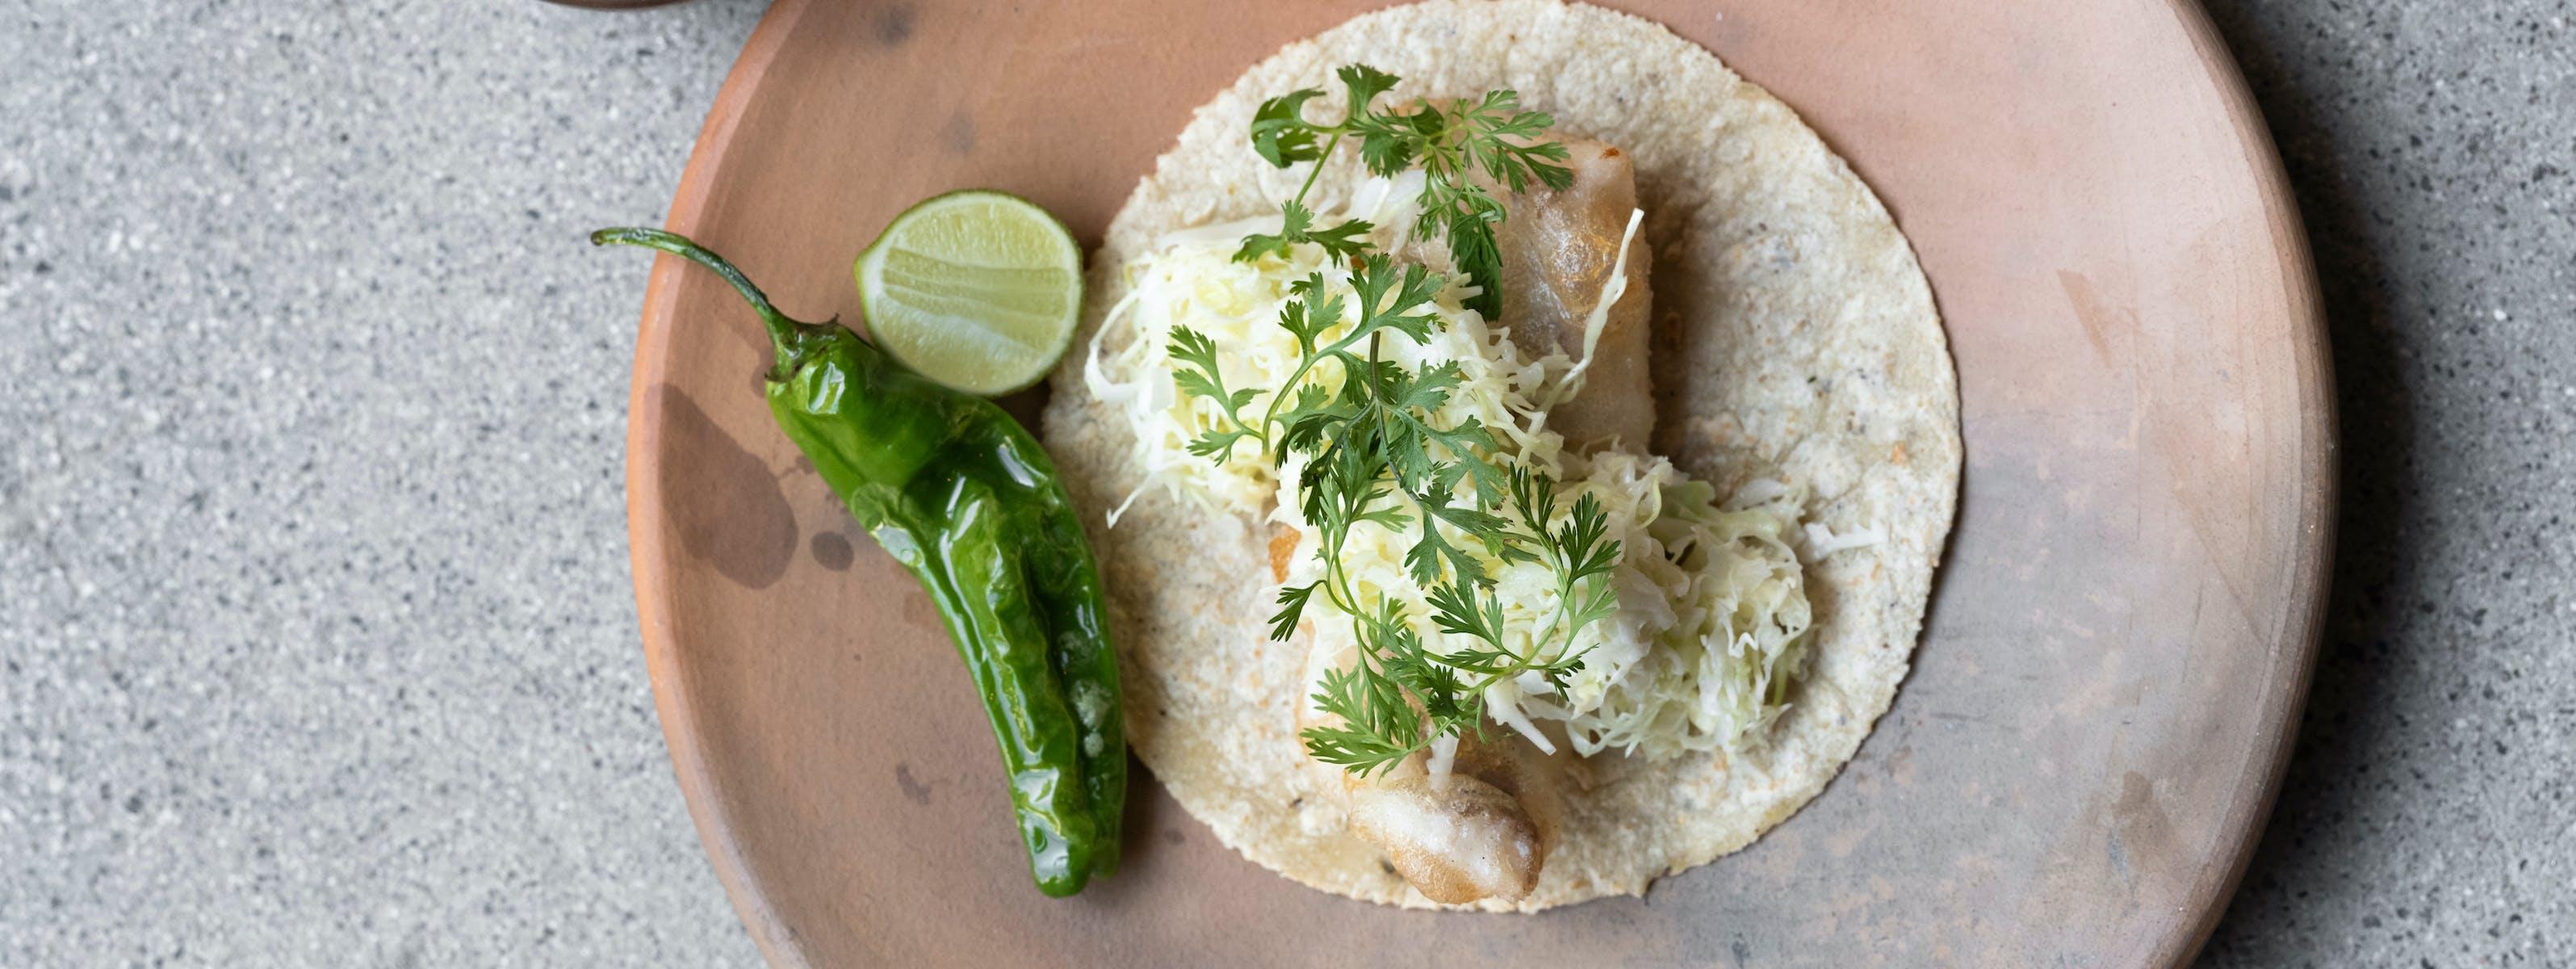 LA's New Restaurant Openings - Los Angeles - The Infatuation